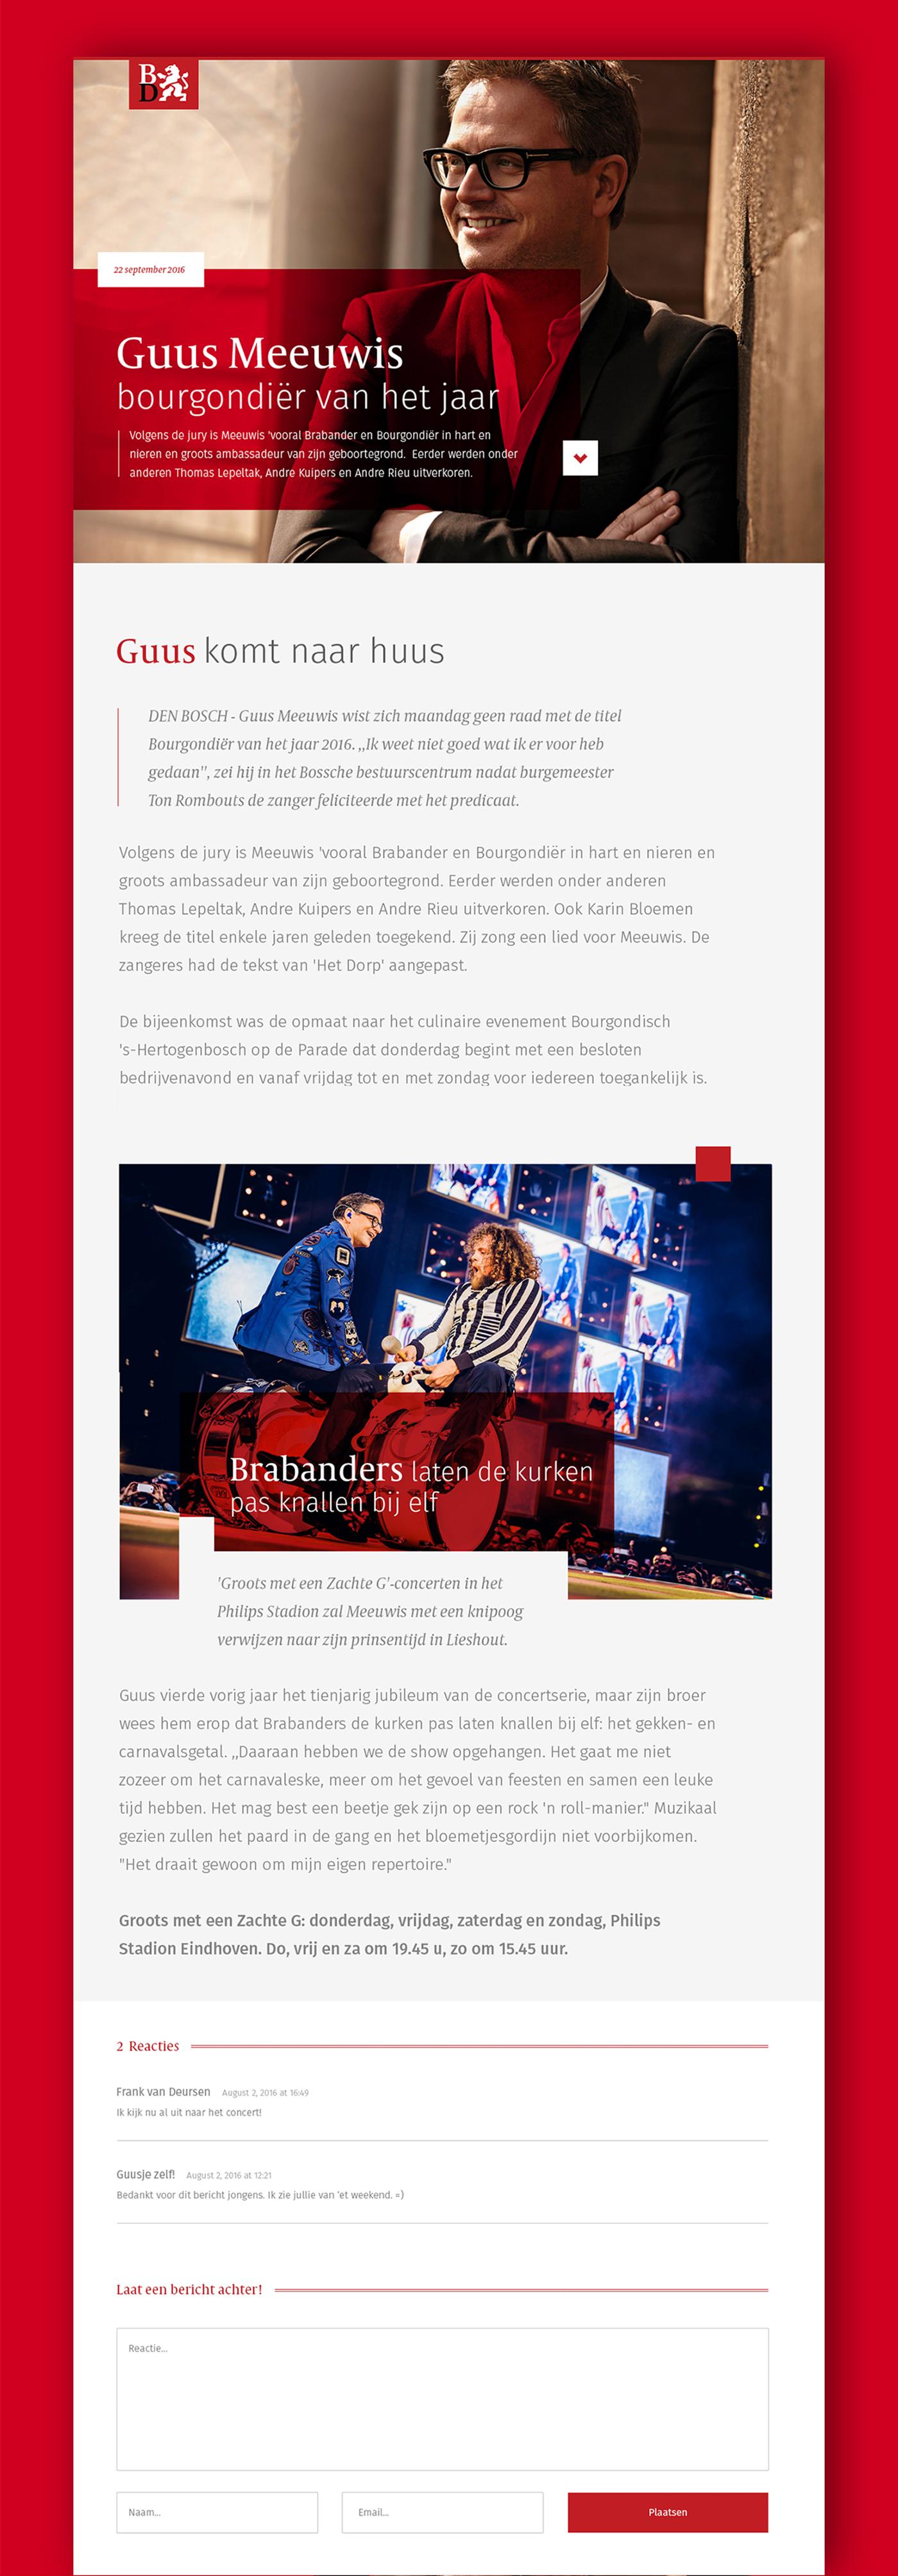 brabant brabants dagblad newspaper longread concept interactive Experience dutch articles Netherlands